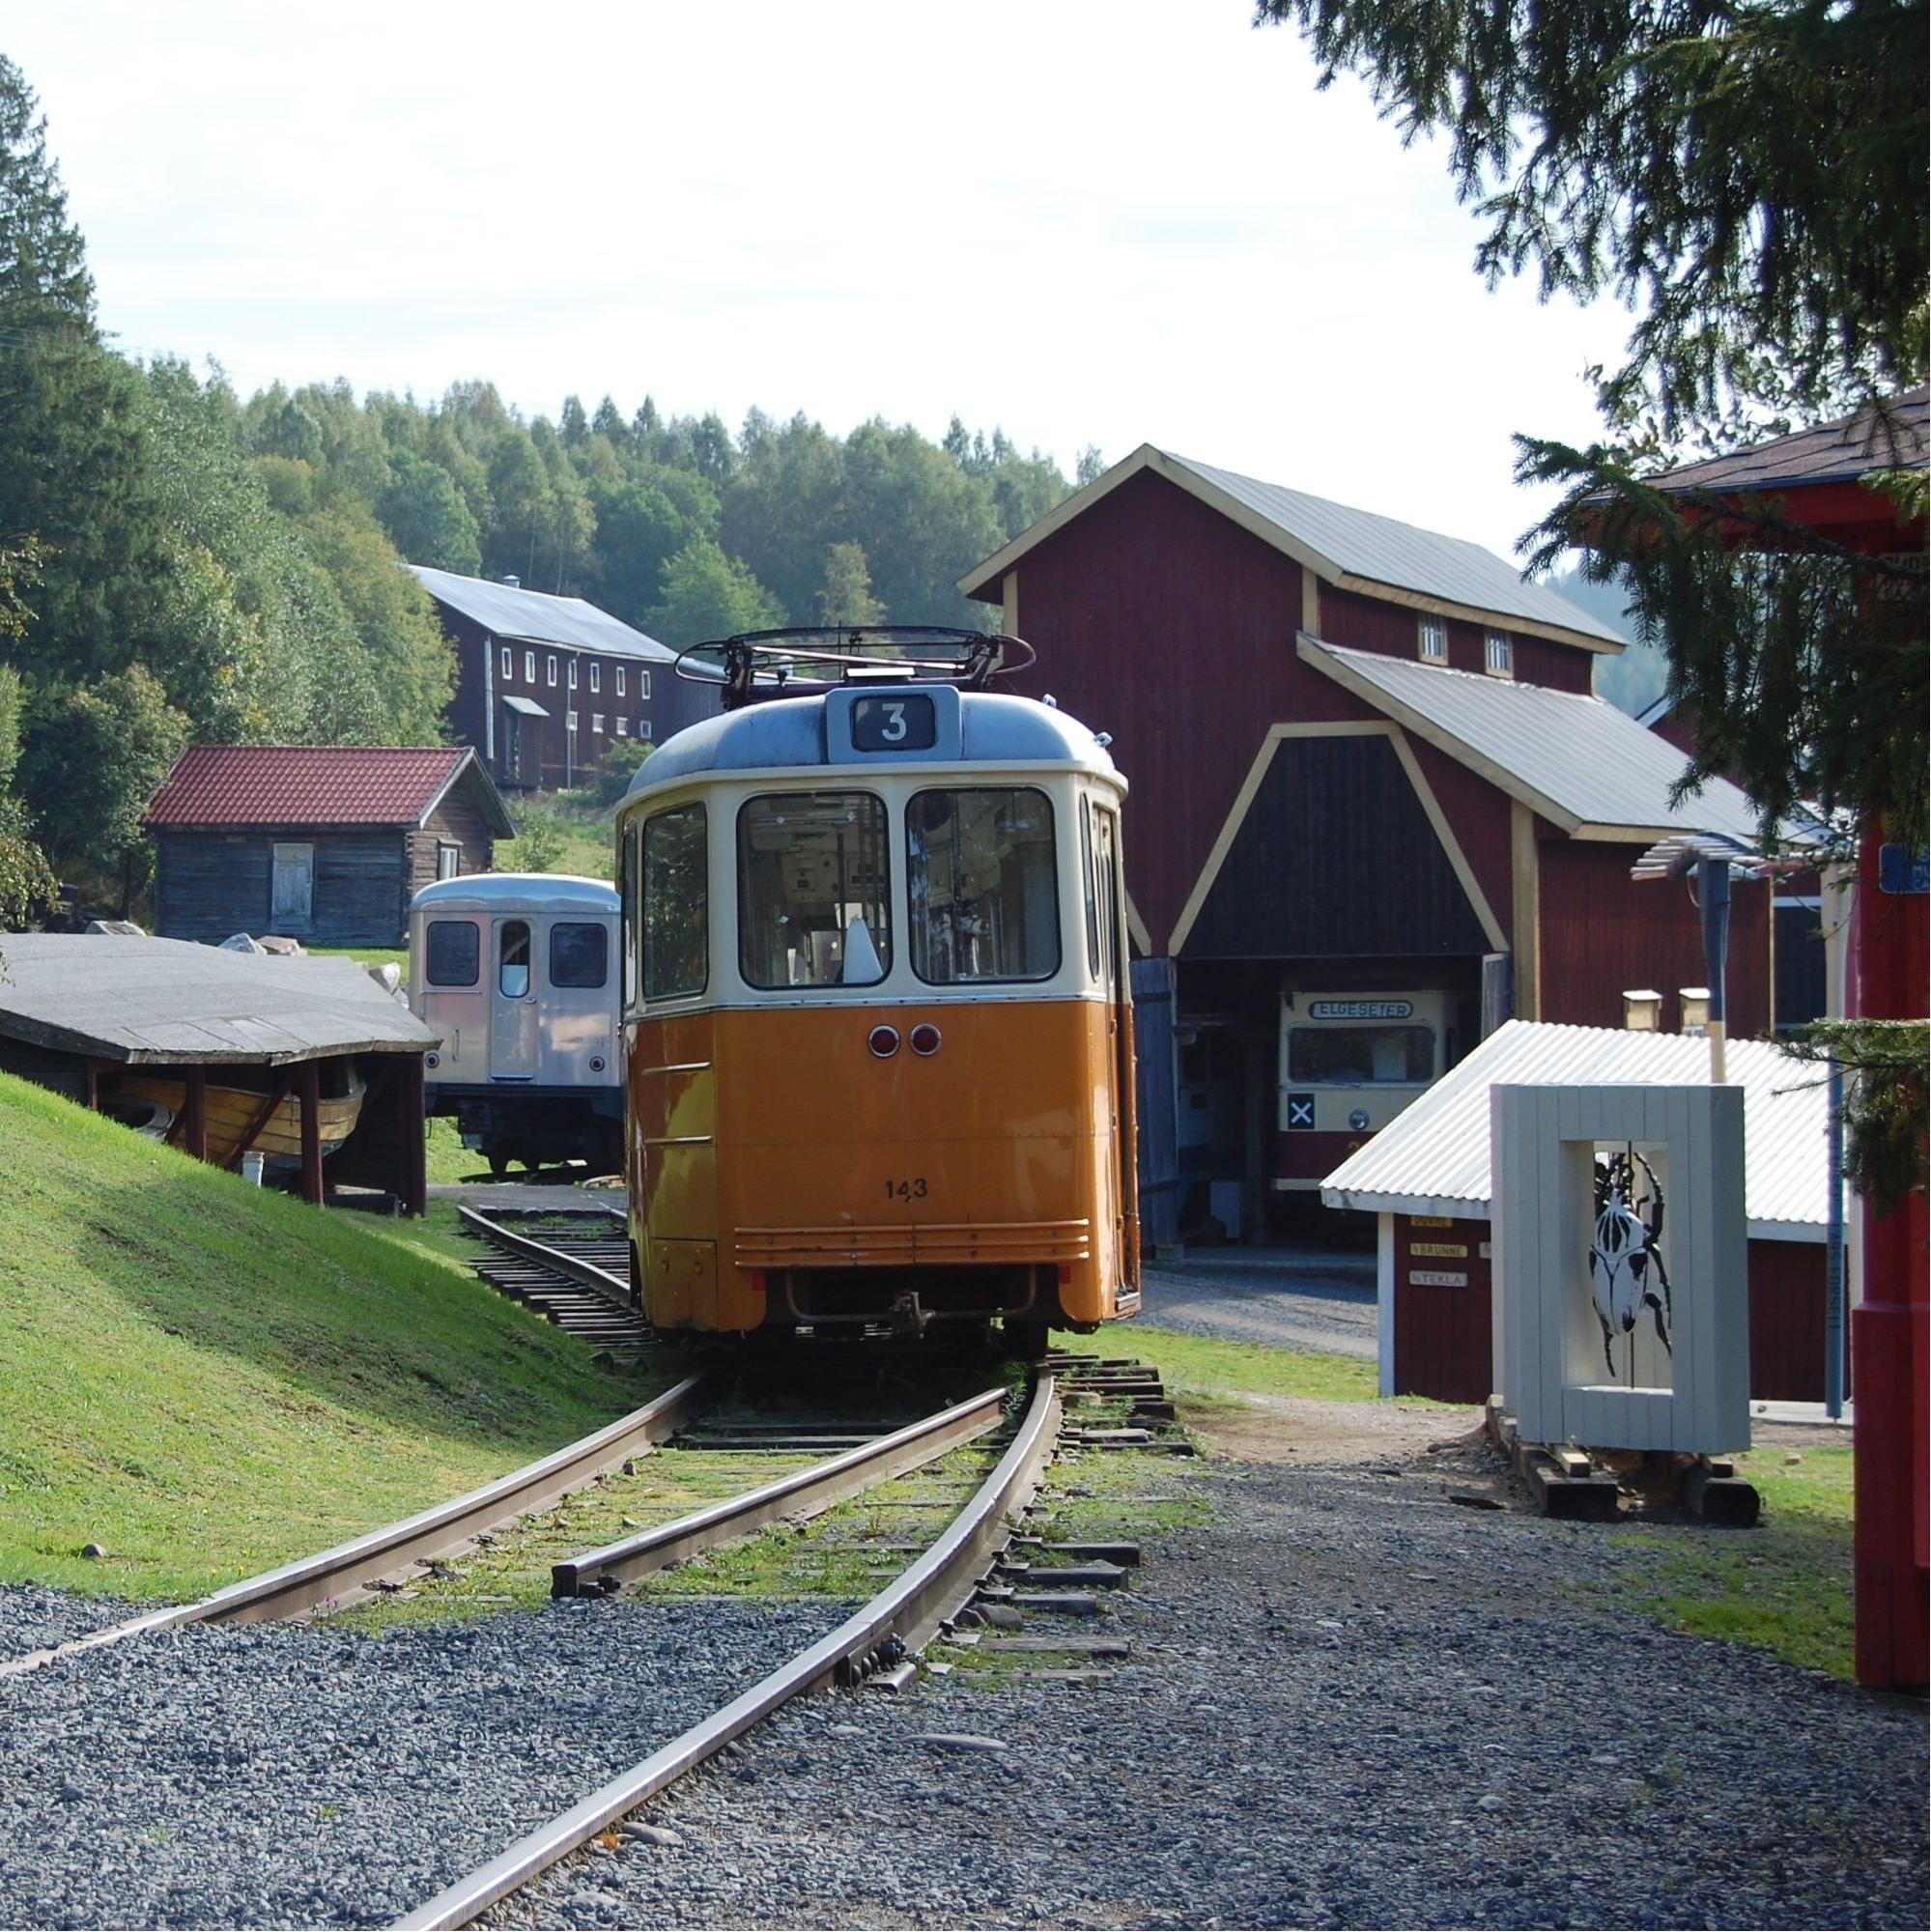 © Kramfors kommun, Mannaminne friluftsmuseum i Nordingrå Höga Kusten